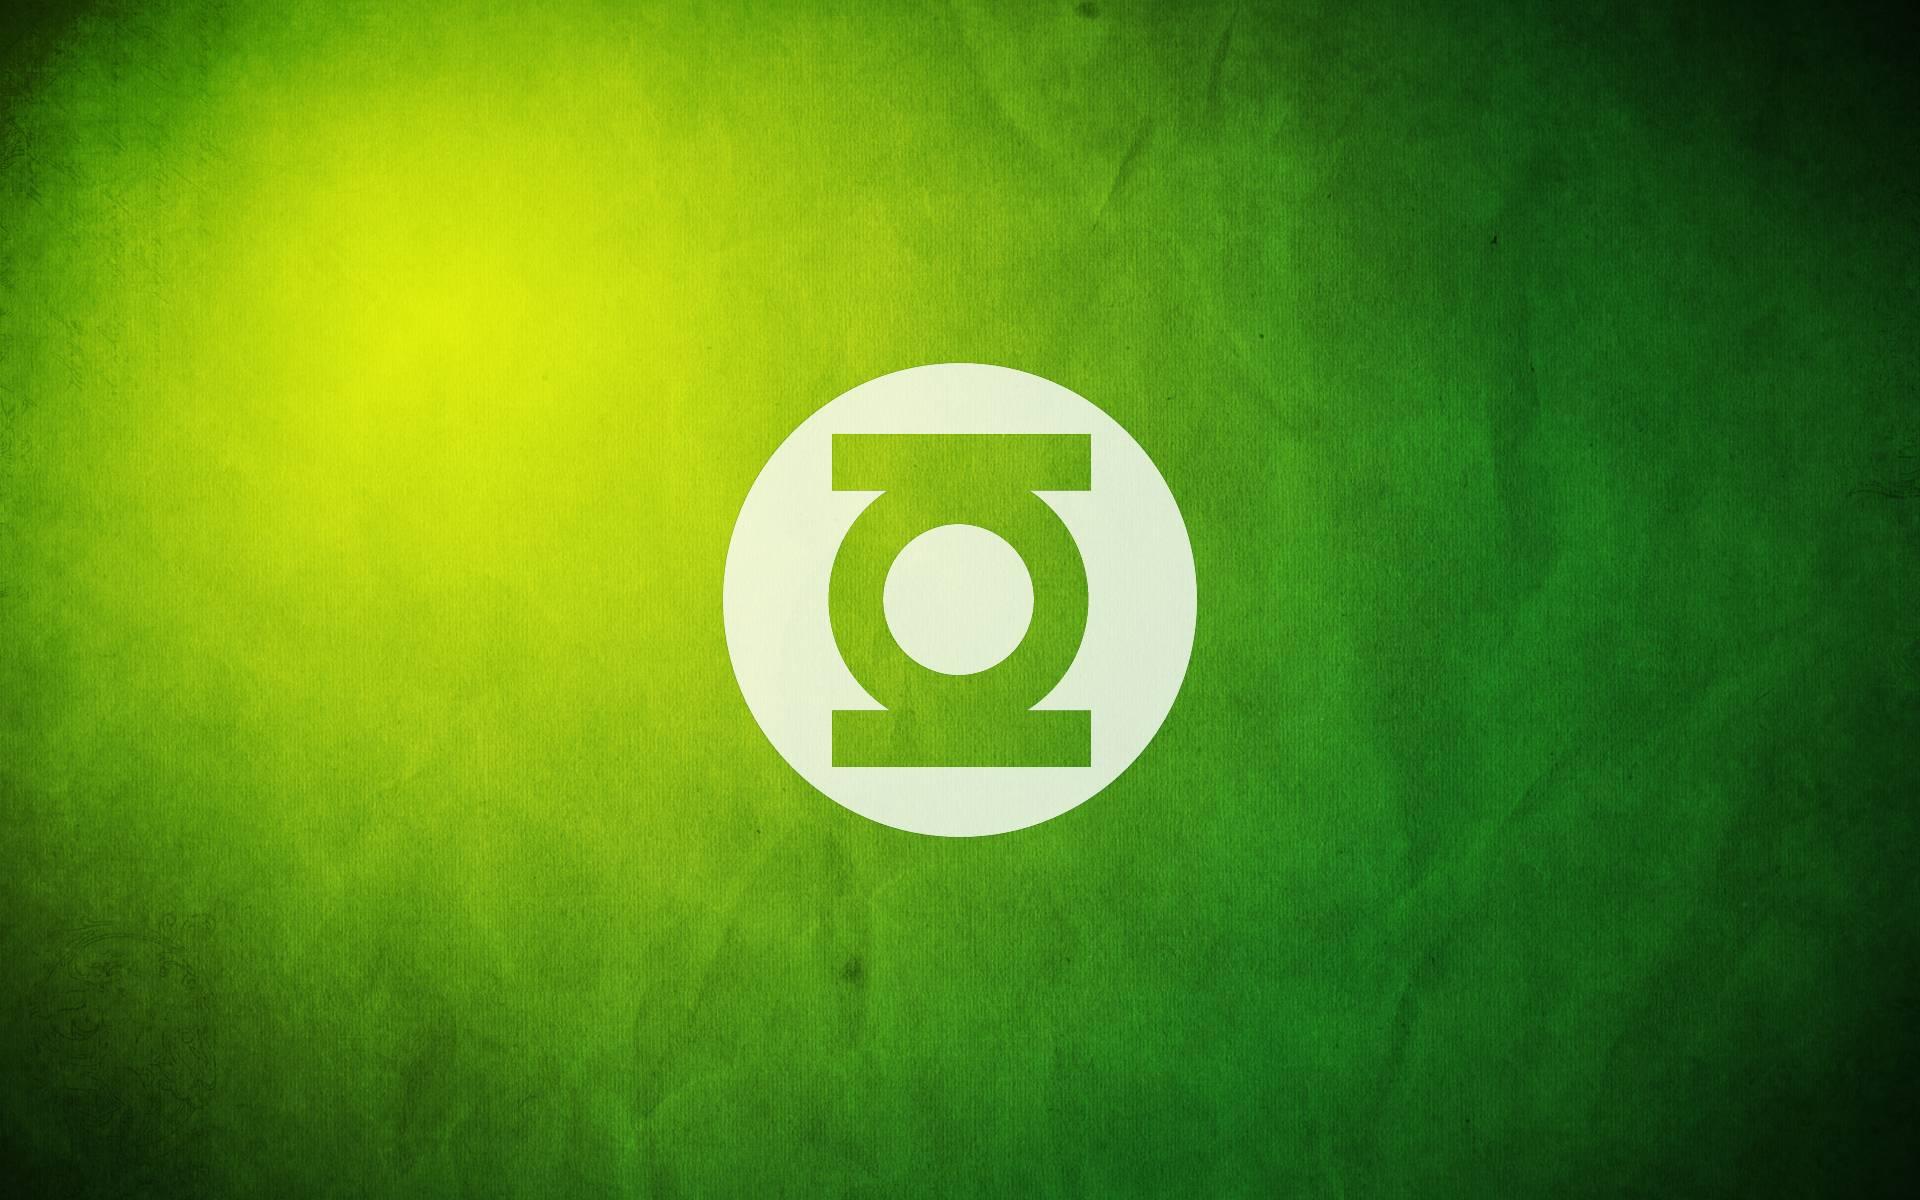 Green Lantern Corps Wallpaper by Willianac on DeviantArt